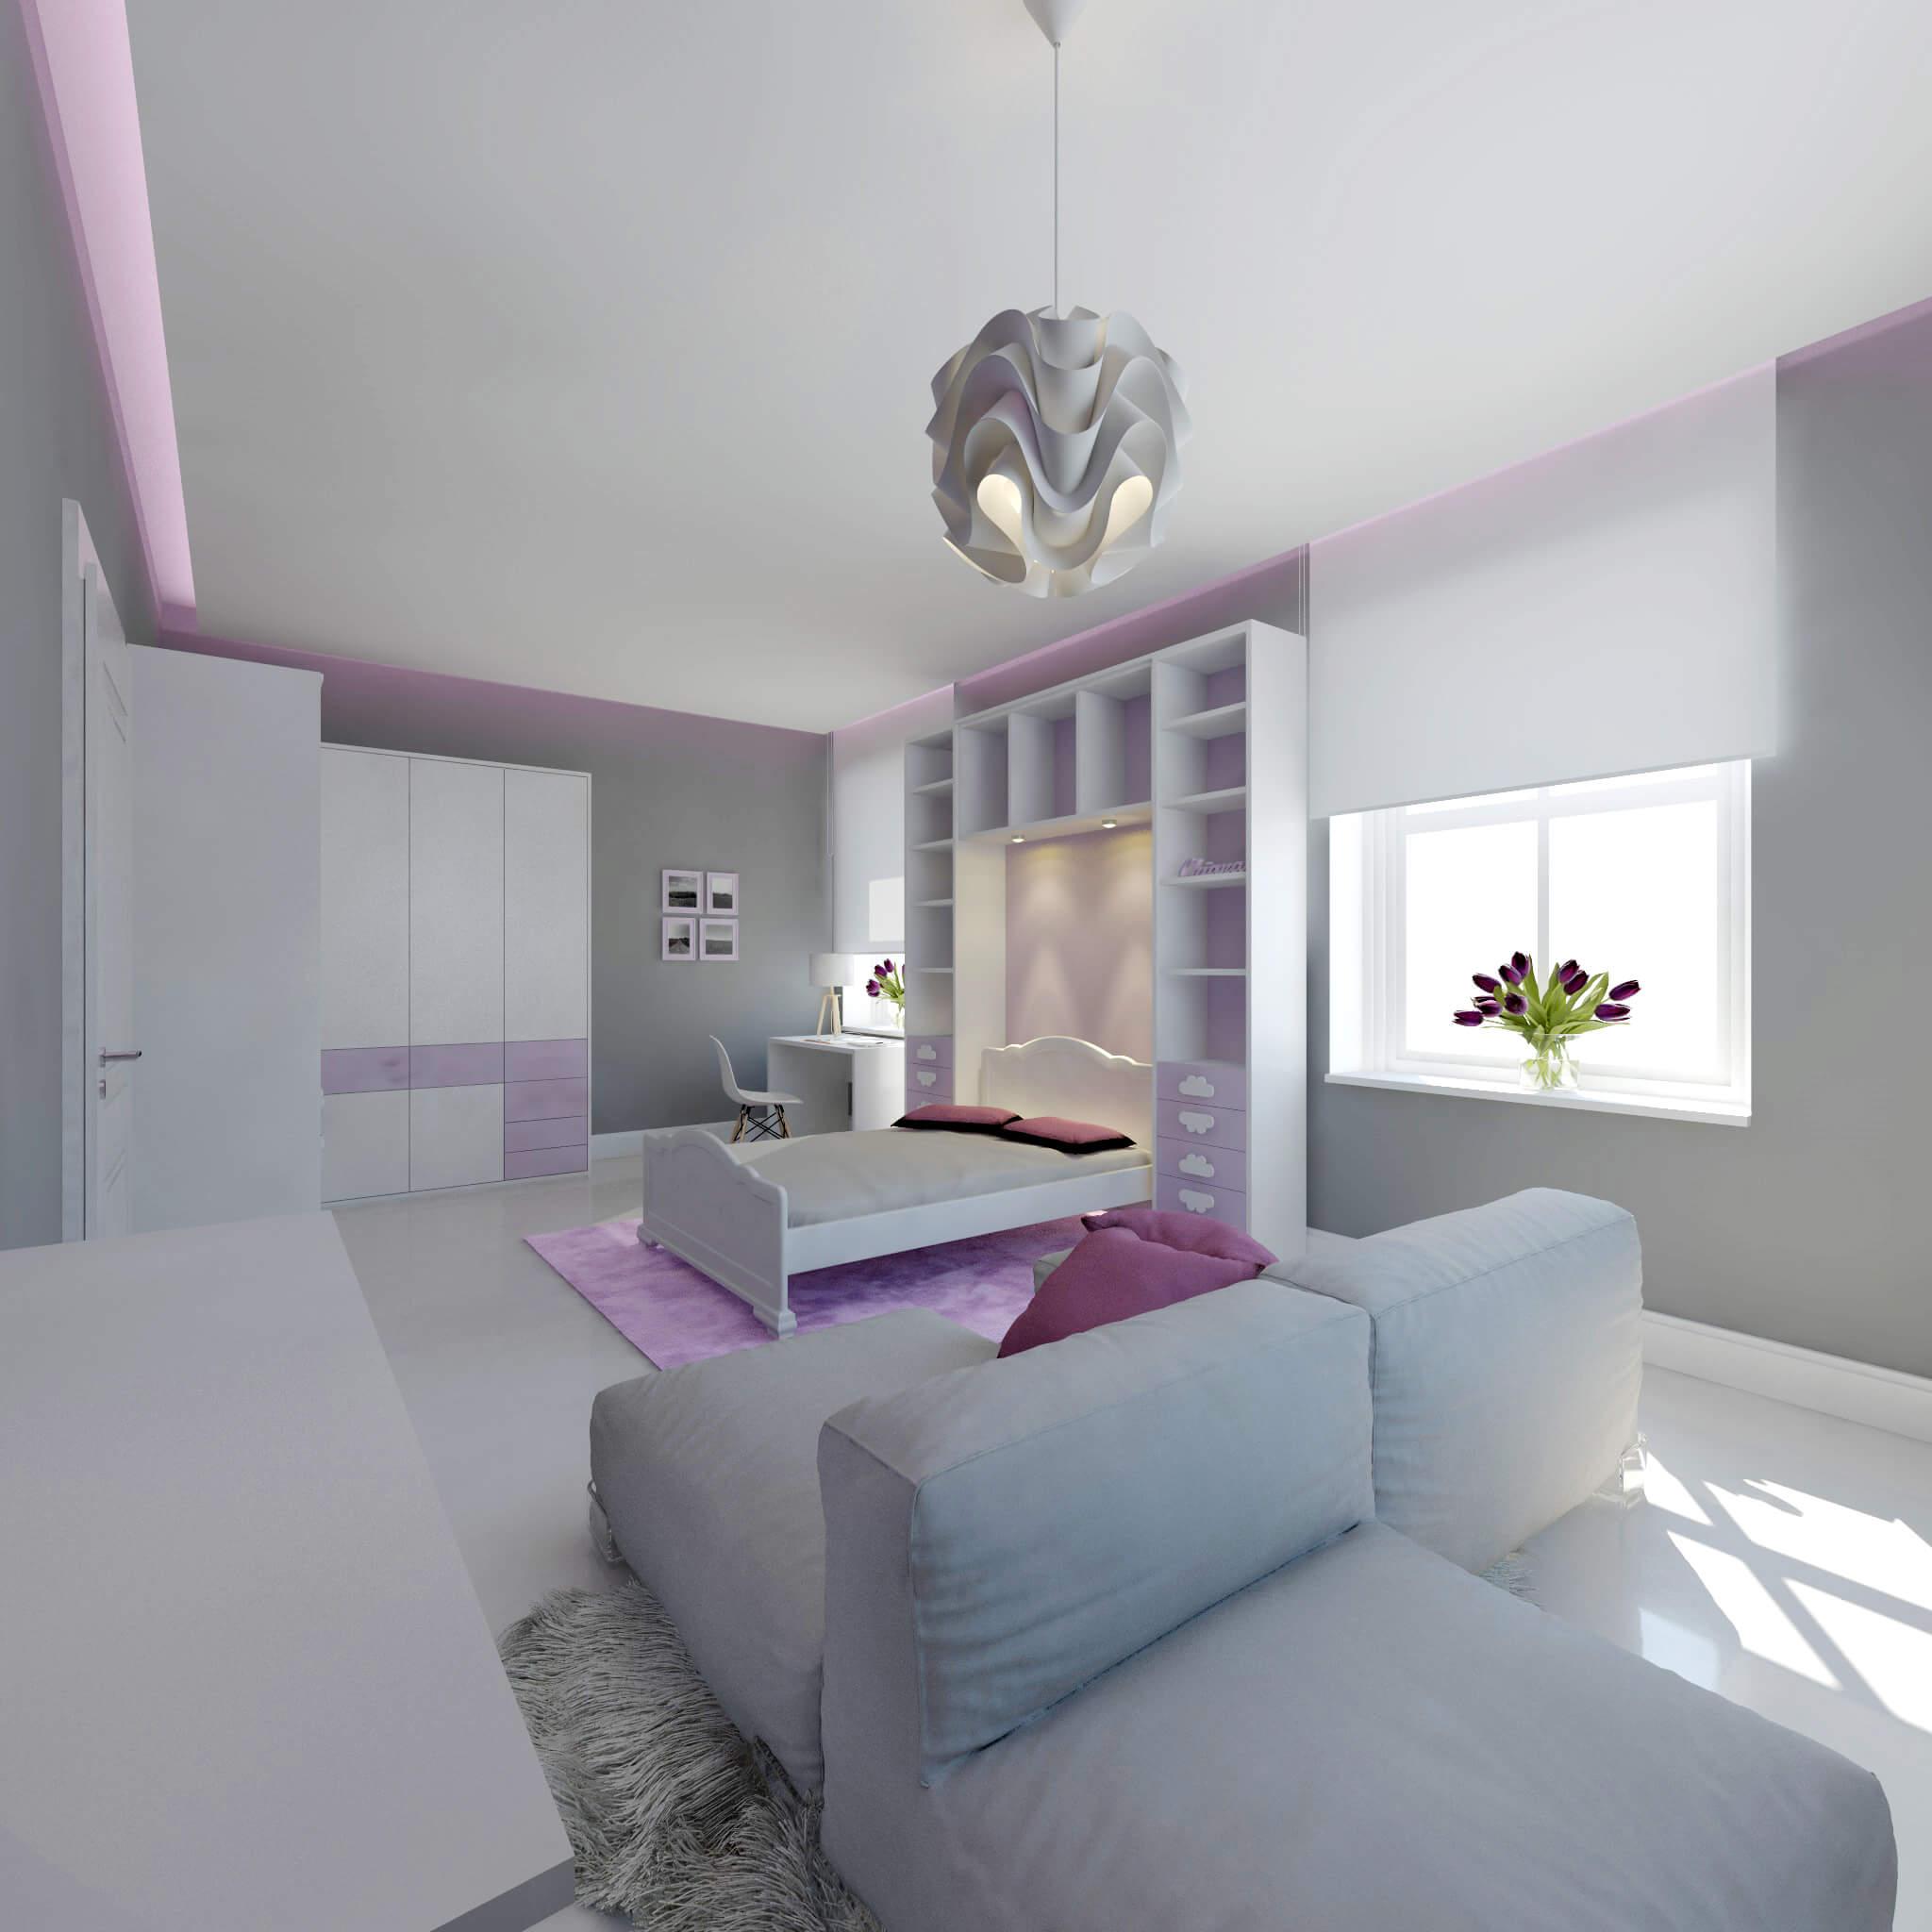 Jugendzimmer Design by Torsten Müller aus Bad Honnef nähe Köln Bonn Verkauf Beratung Planung Interior Designer 3D Lifestyle- (9)